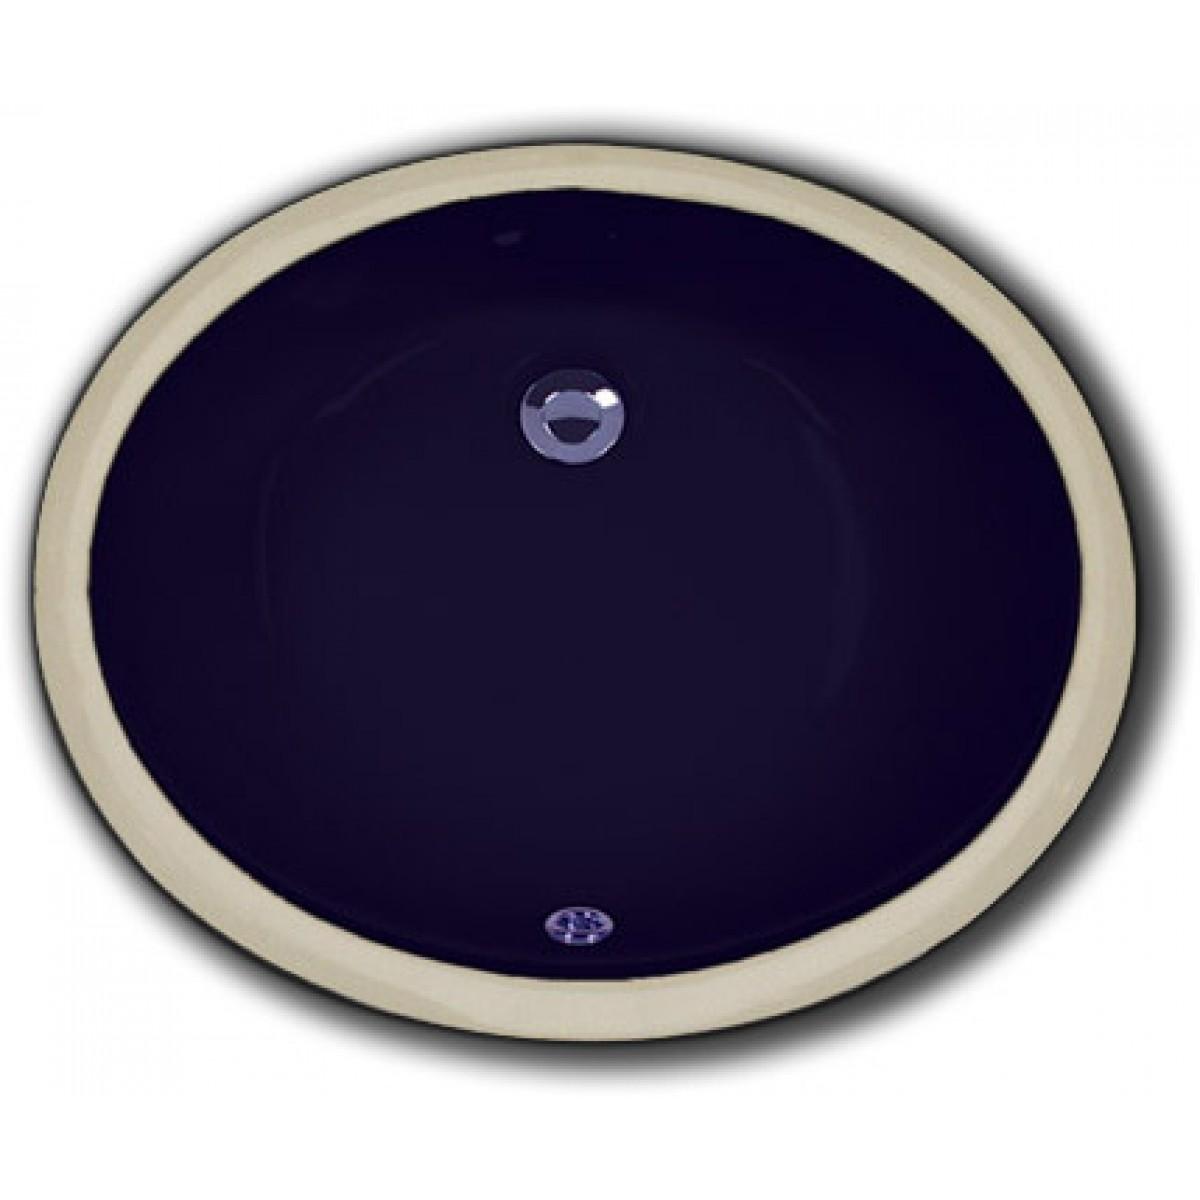 Black Porcelain Ceramic Vanity Undermount Bathroom Vessel Sink   17 X 14 X  6 Inch